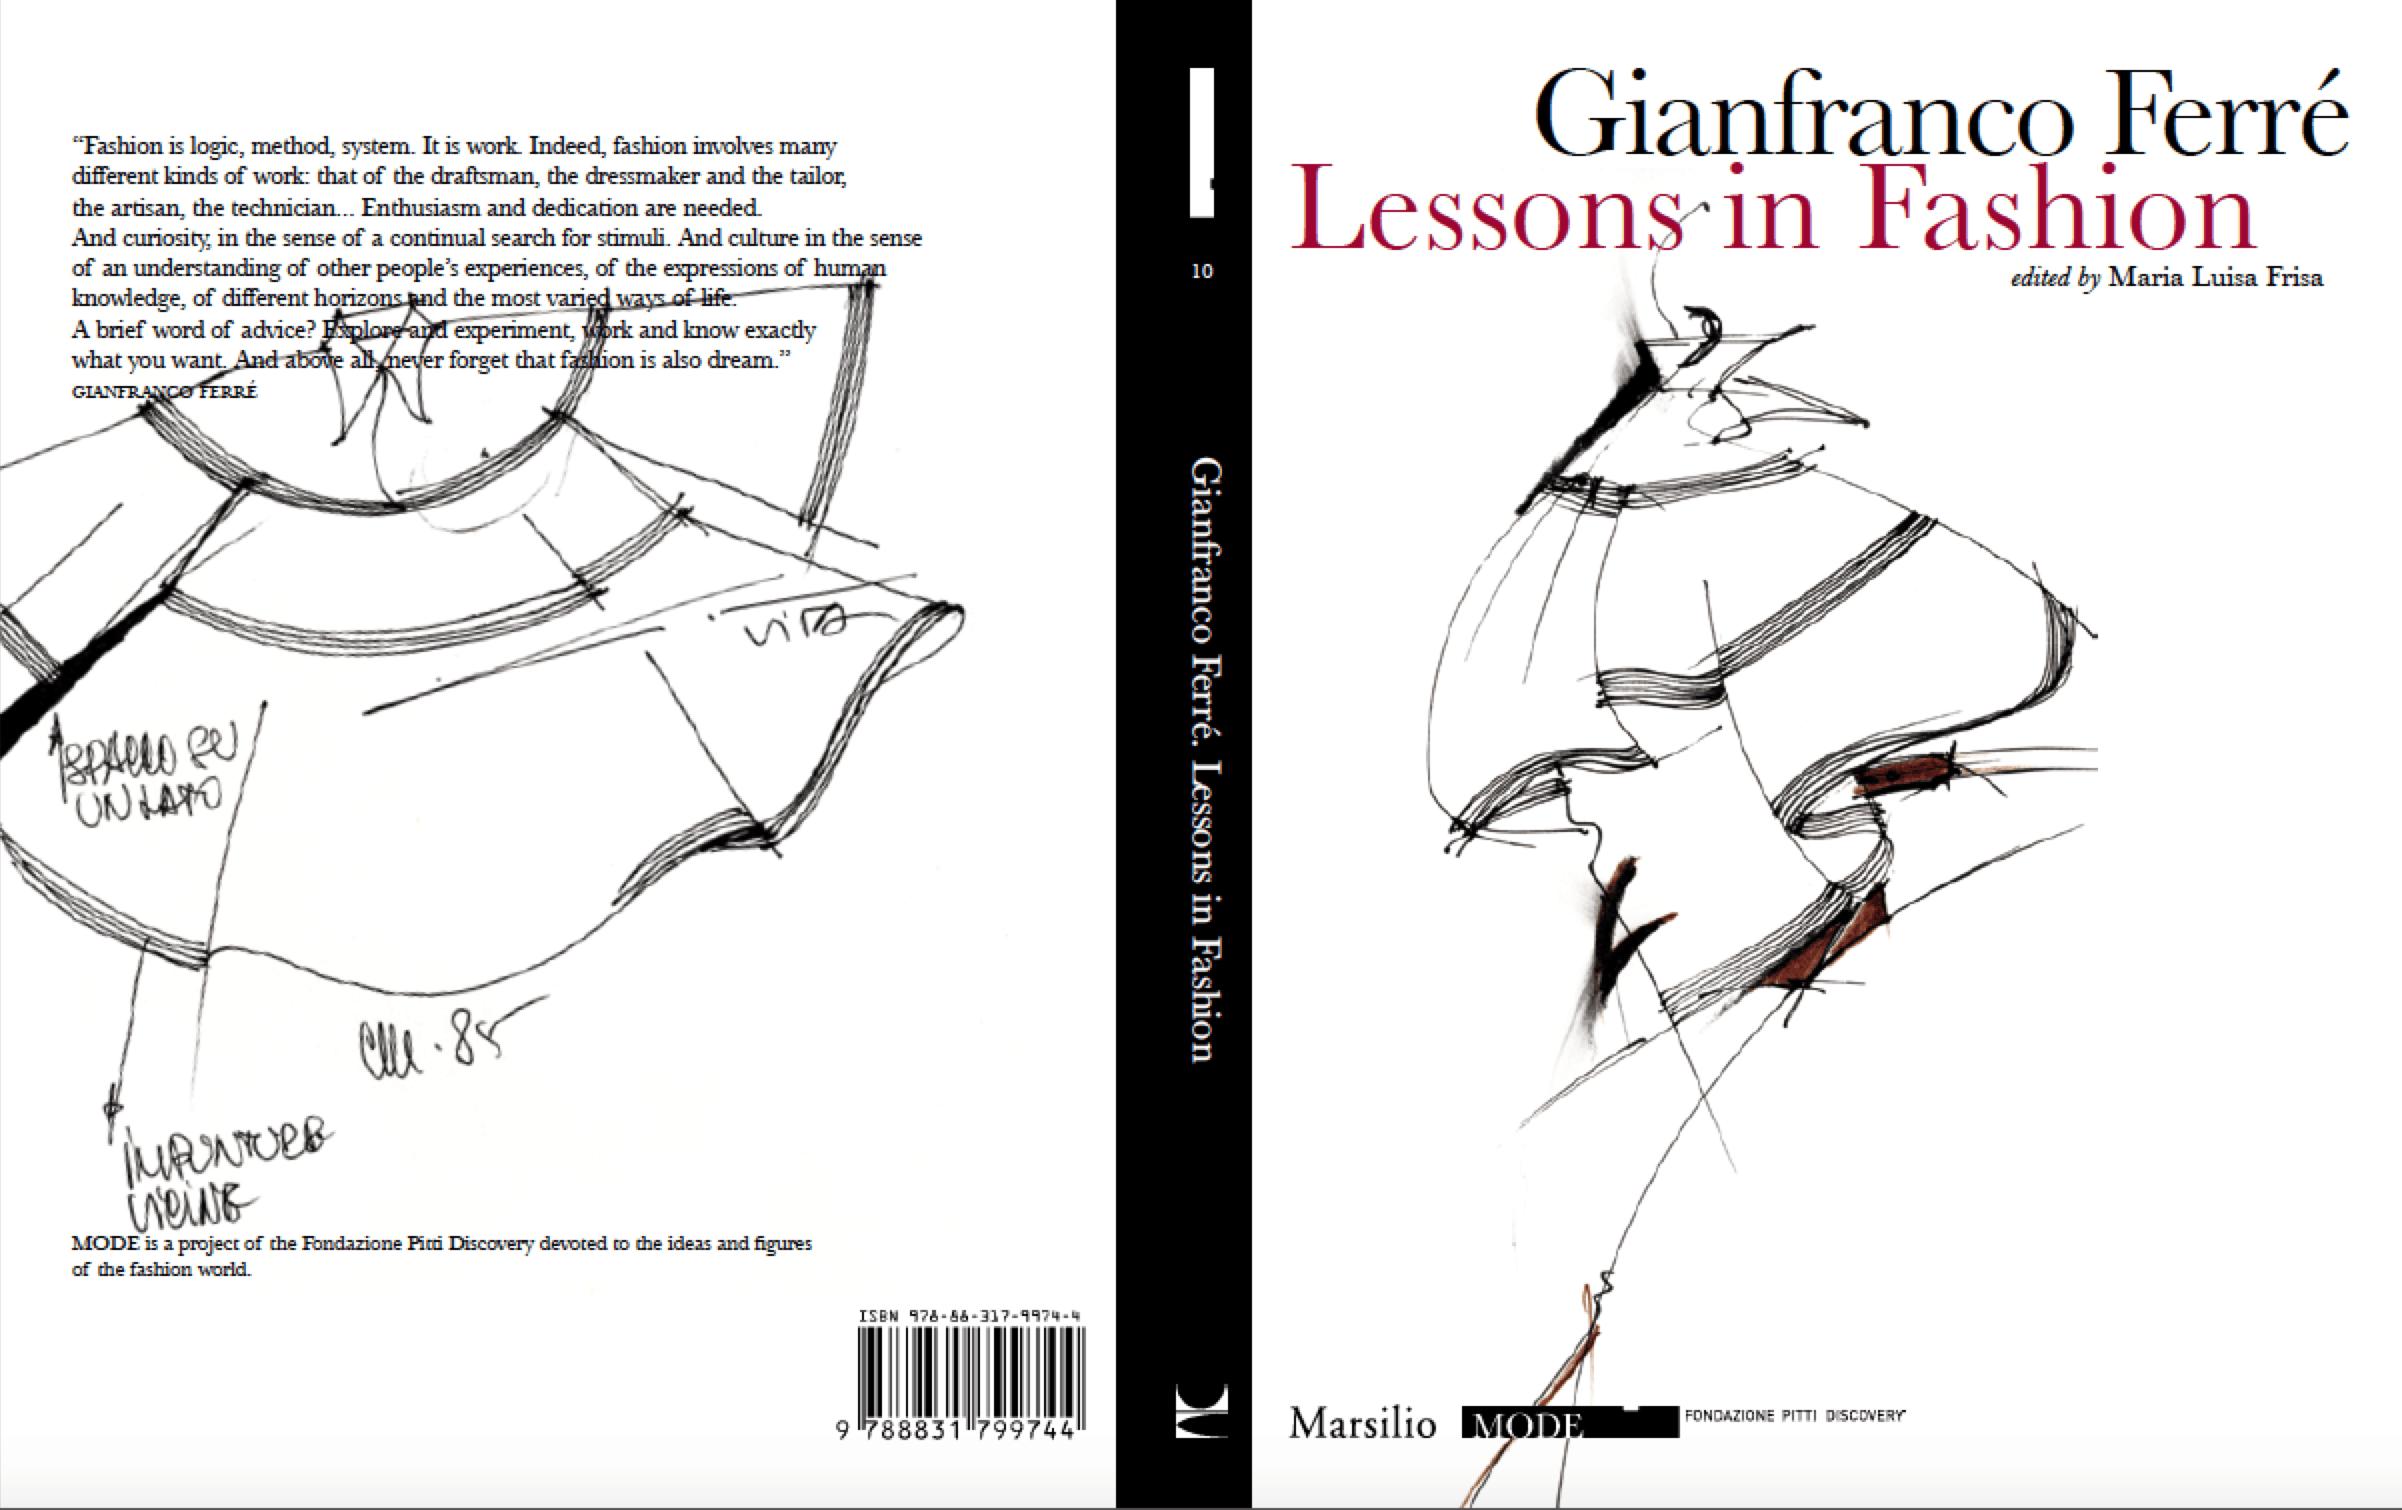 Gianfranco Ferre Foundation Lessons in Fashion